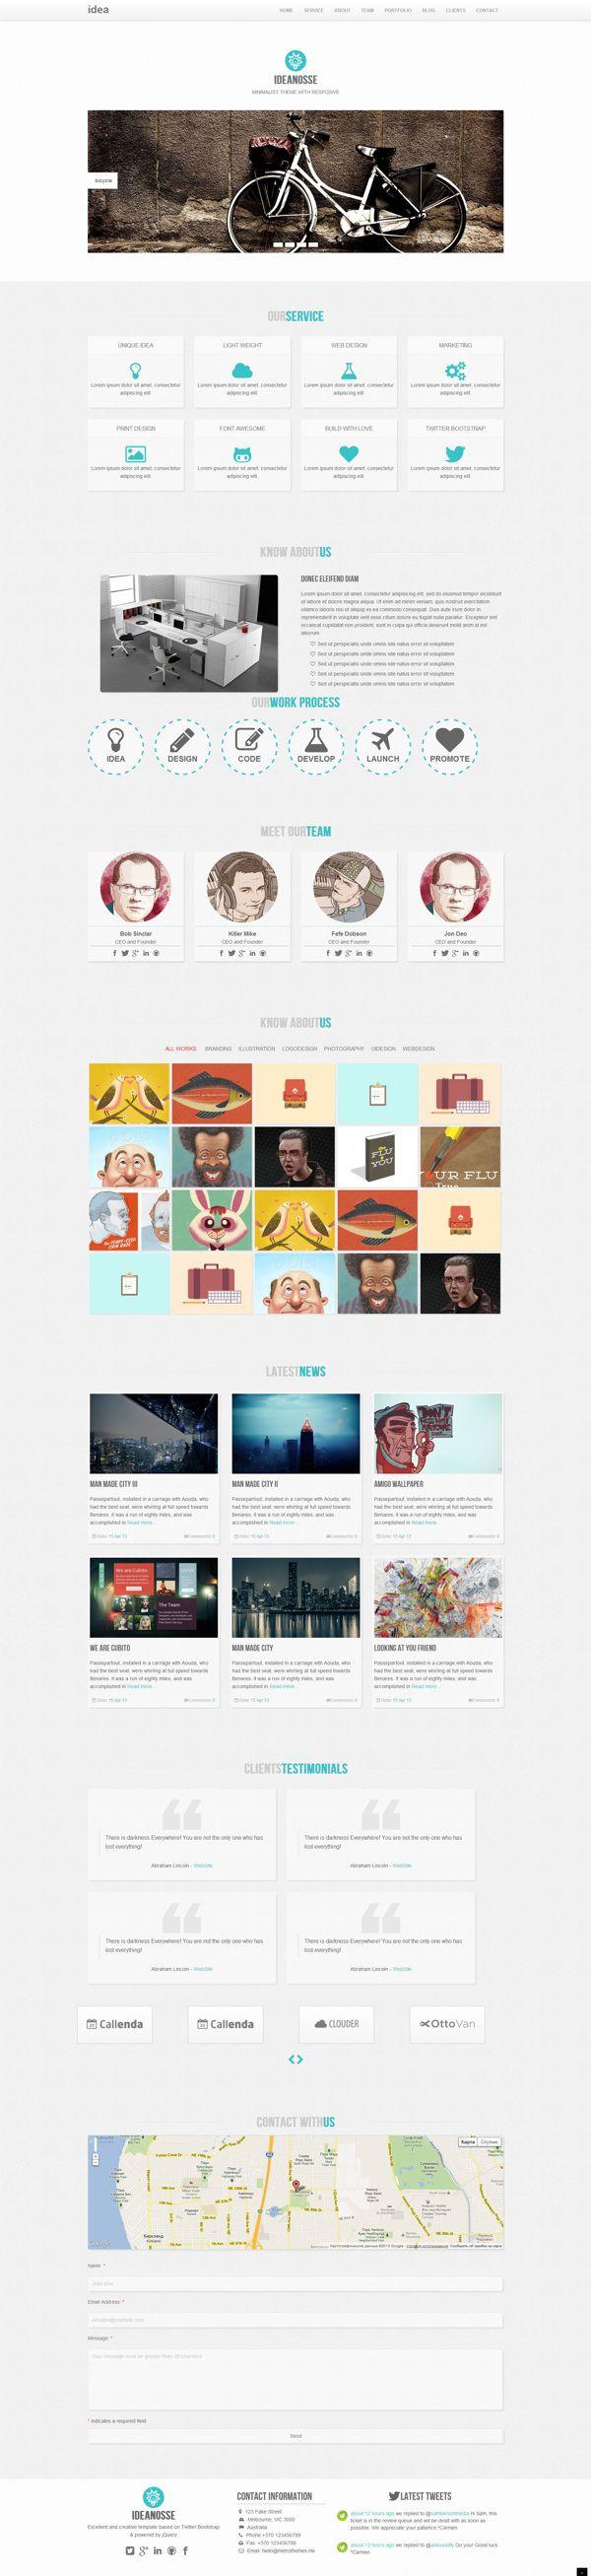 Ideanosse - Responsive One Page WordPress Theme by Zizaza - design ocean , via Behance